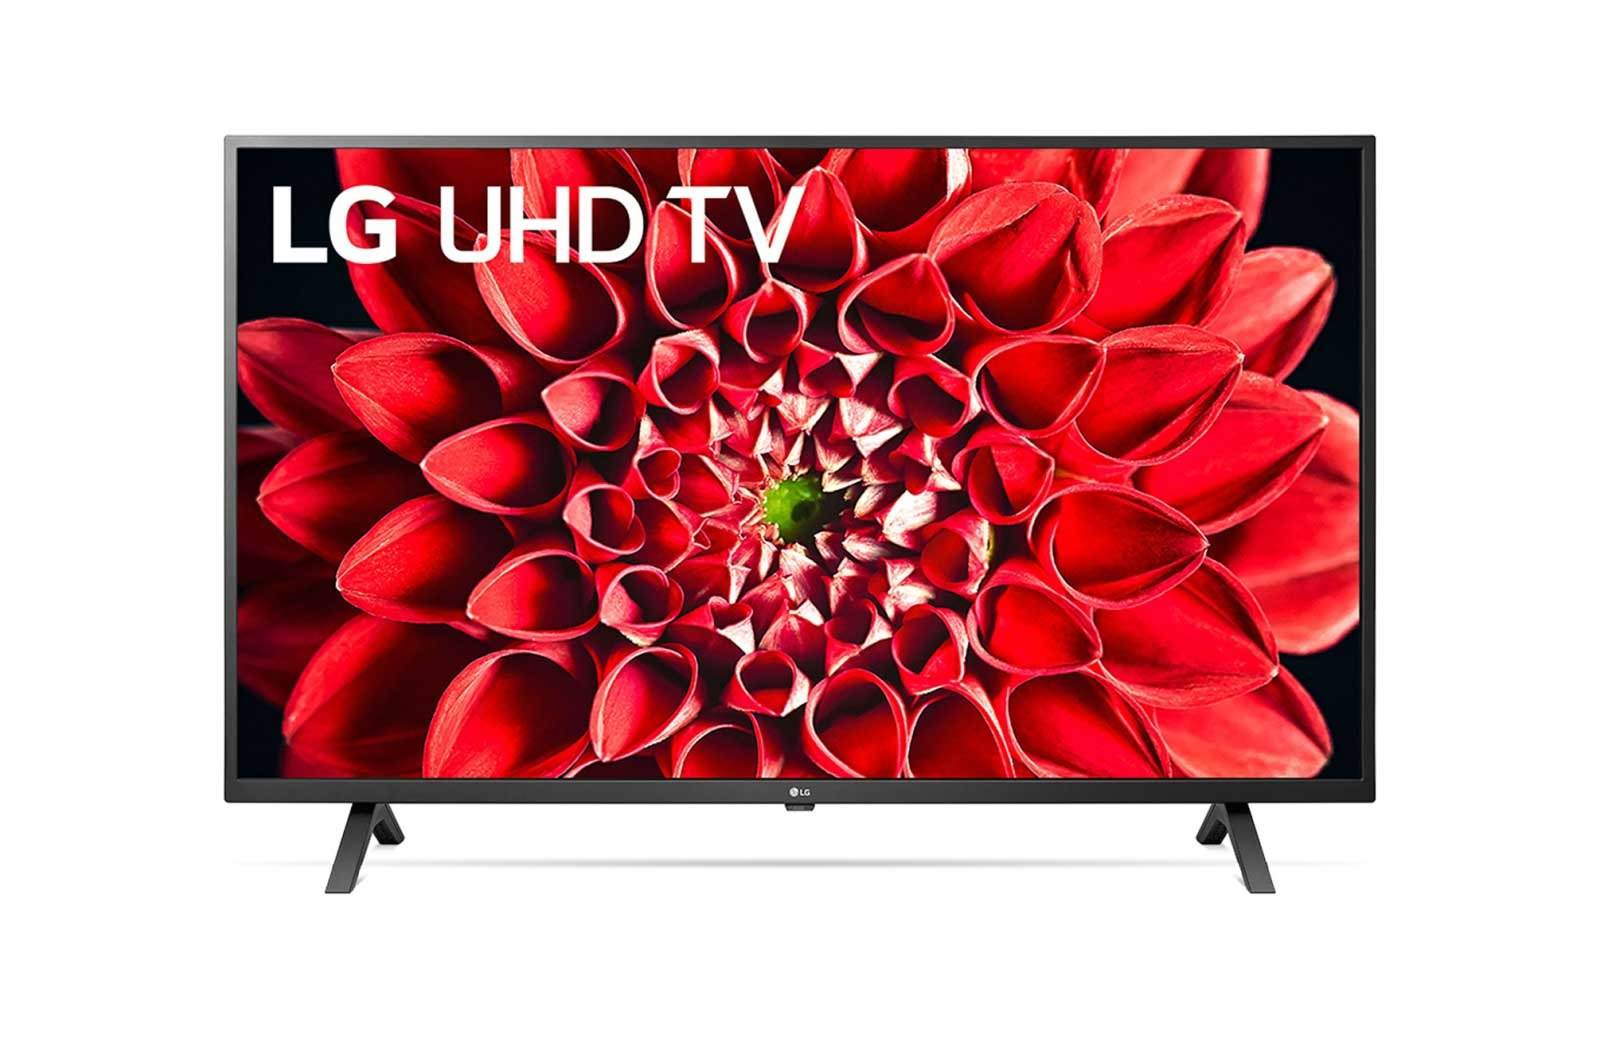 LG 55UN70006LA 55 inch UHD TV